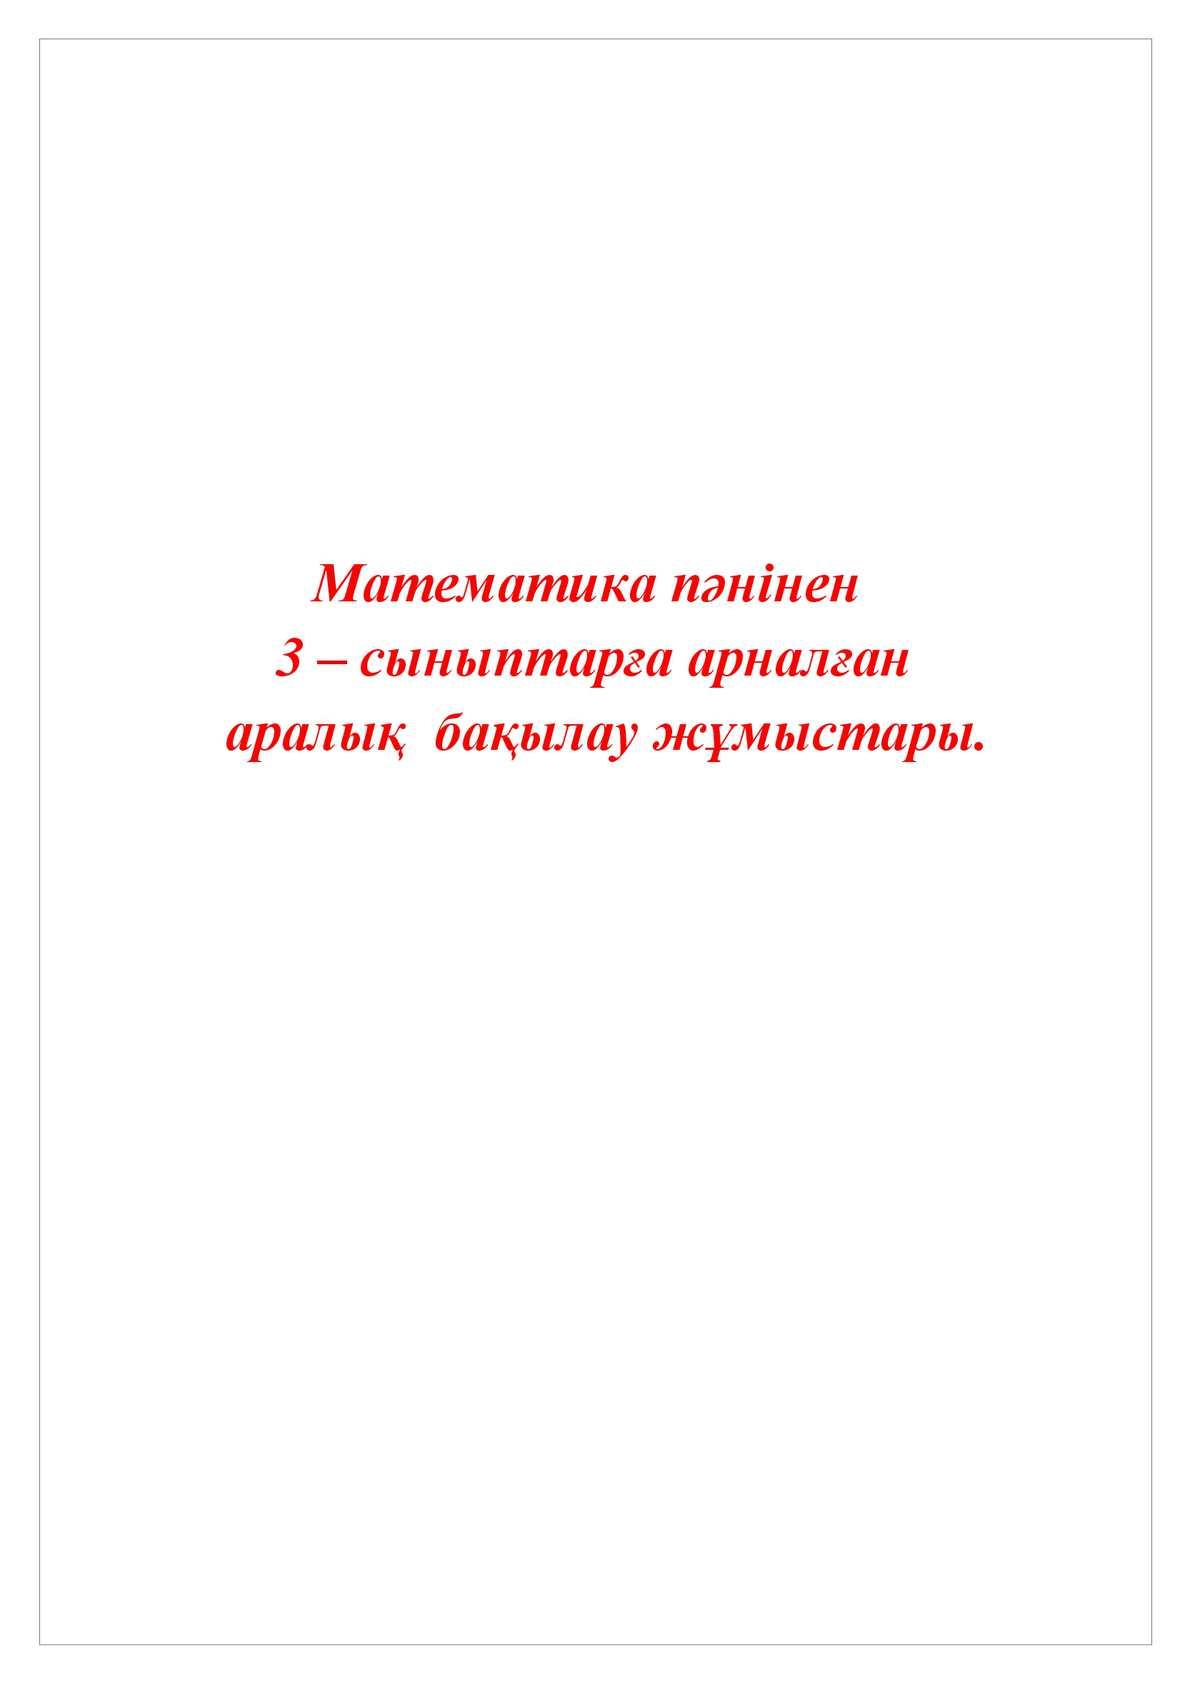 Математикадан тапсырмалар 3-сынып